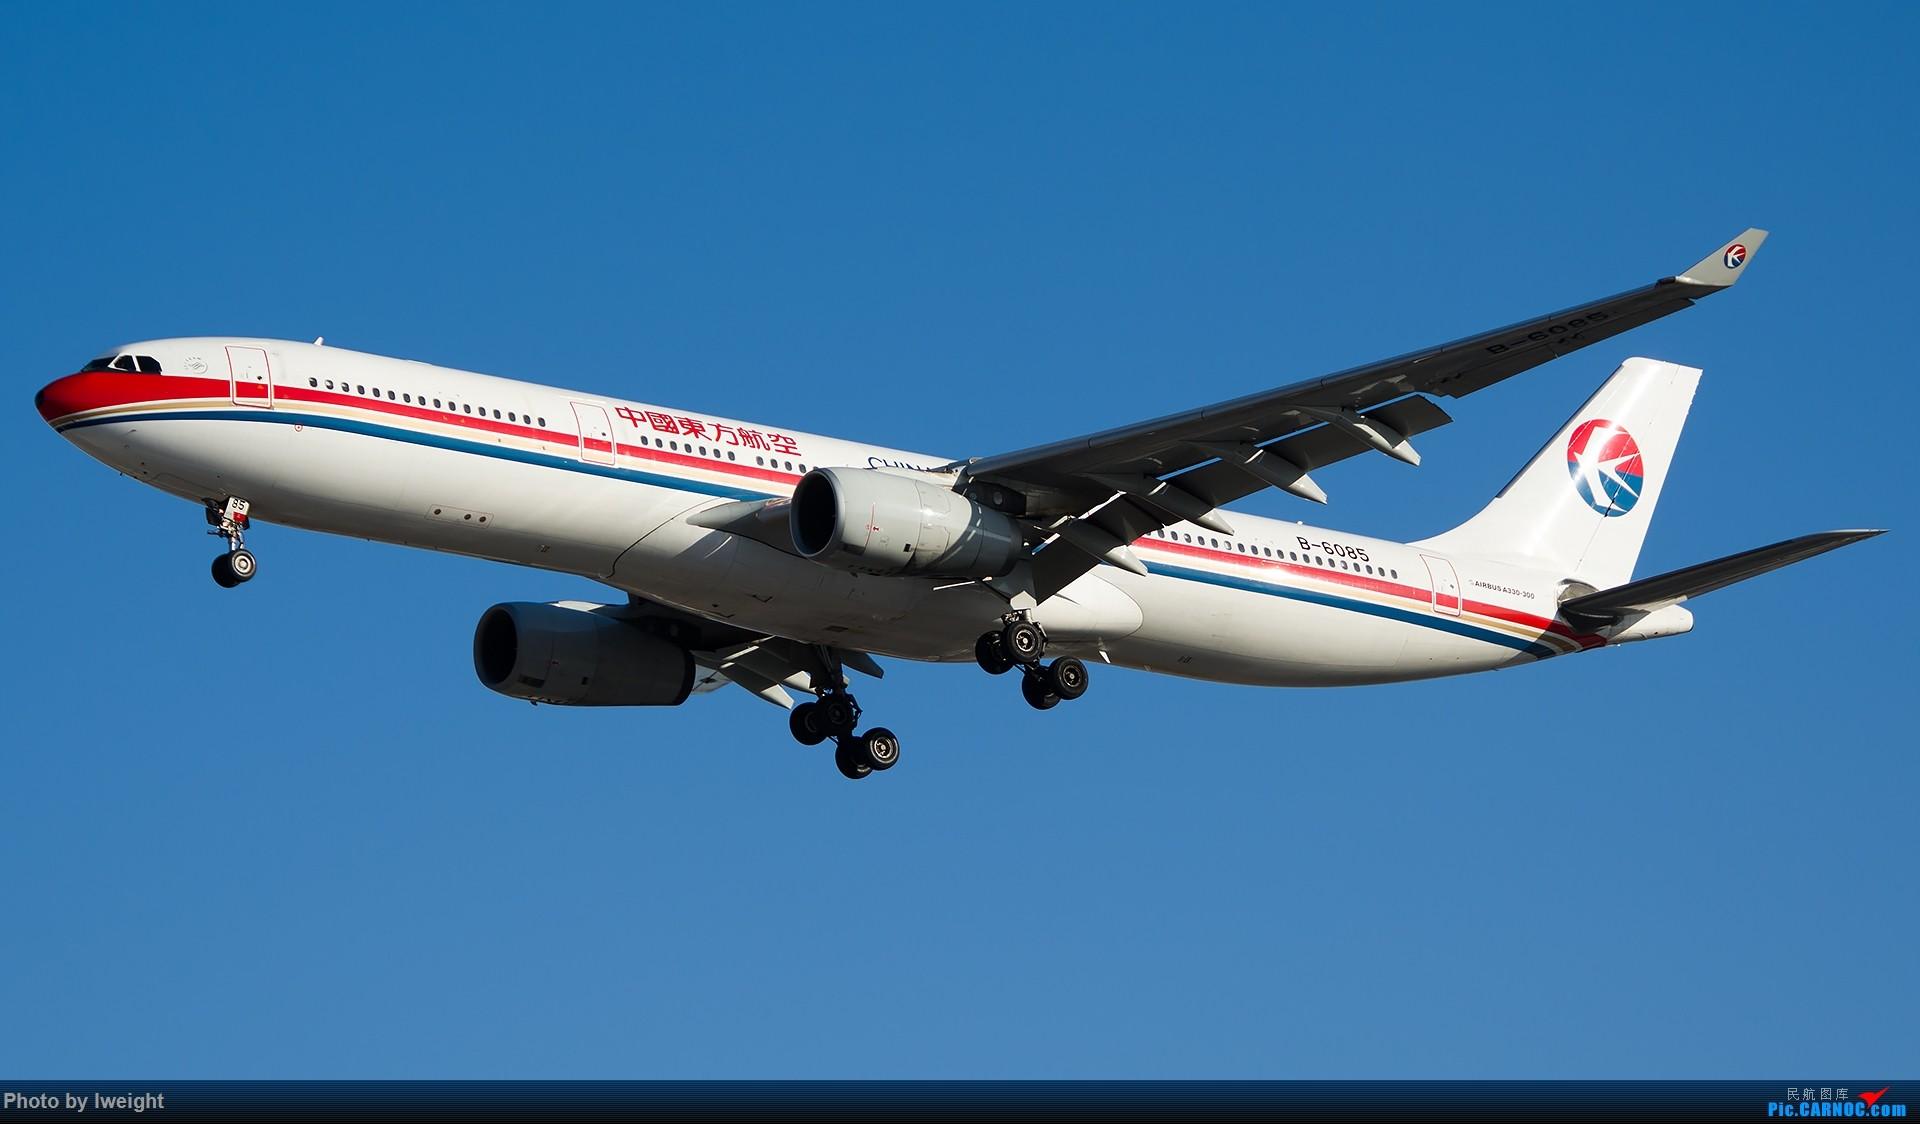 Re:[原创]北京难得的好天气,随手拍了一些渣图【2015-01-27】 AIRBUS A330-300 B-6085 中国北京首都国际机场